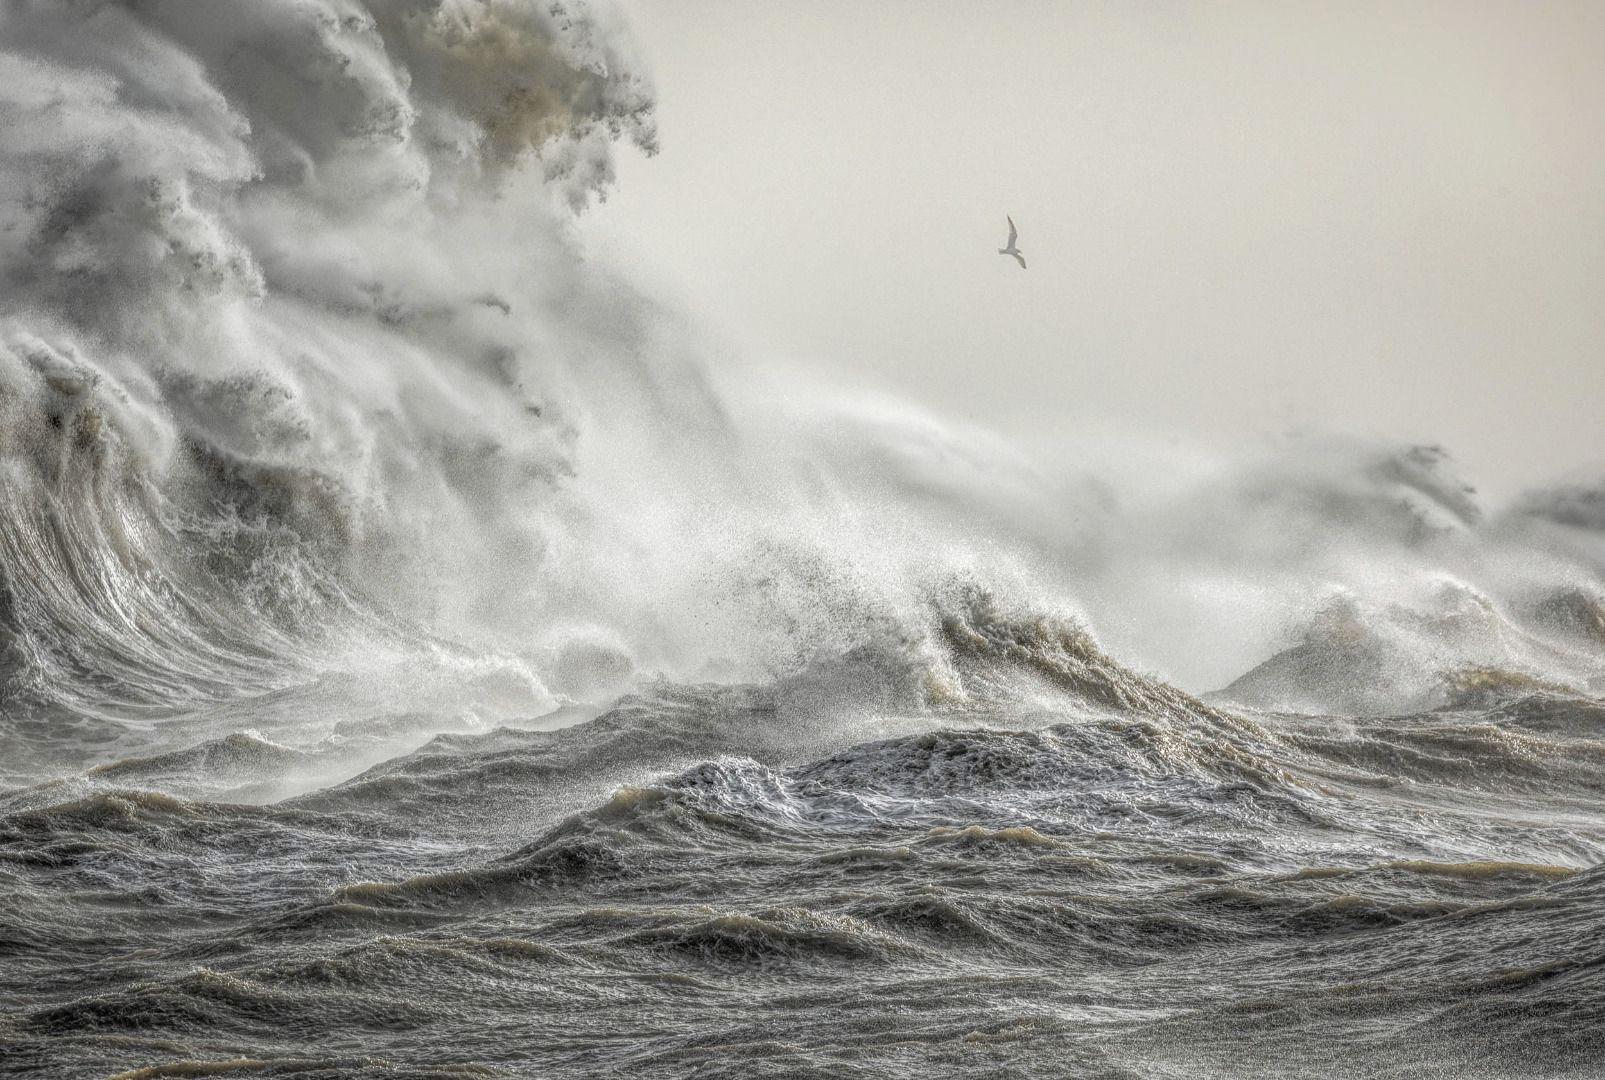 Гнев Элеоноры, © Билл Брукс, Фотоконкурс «Погодный фотограф года» — Weather Photographer of the Year